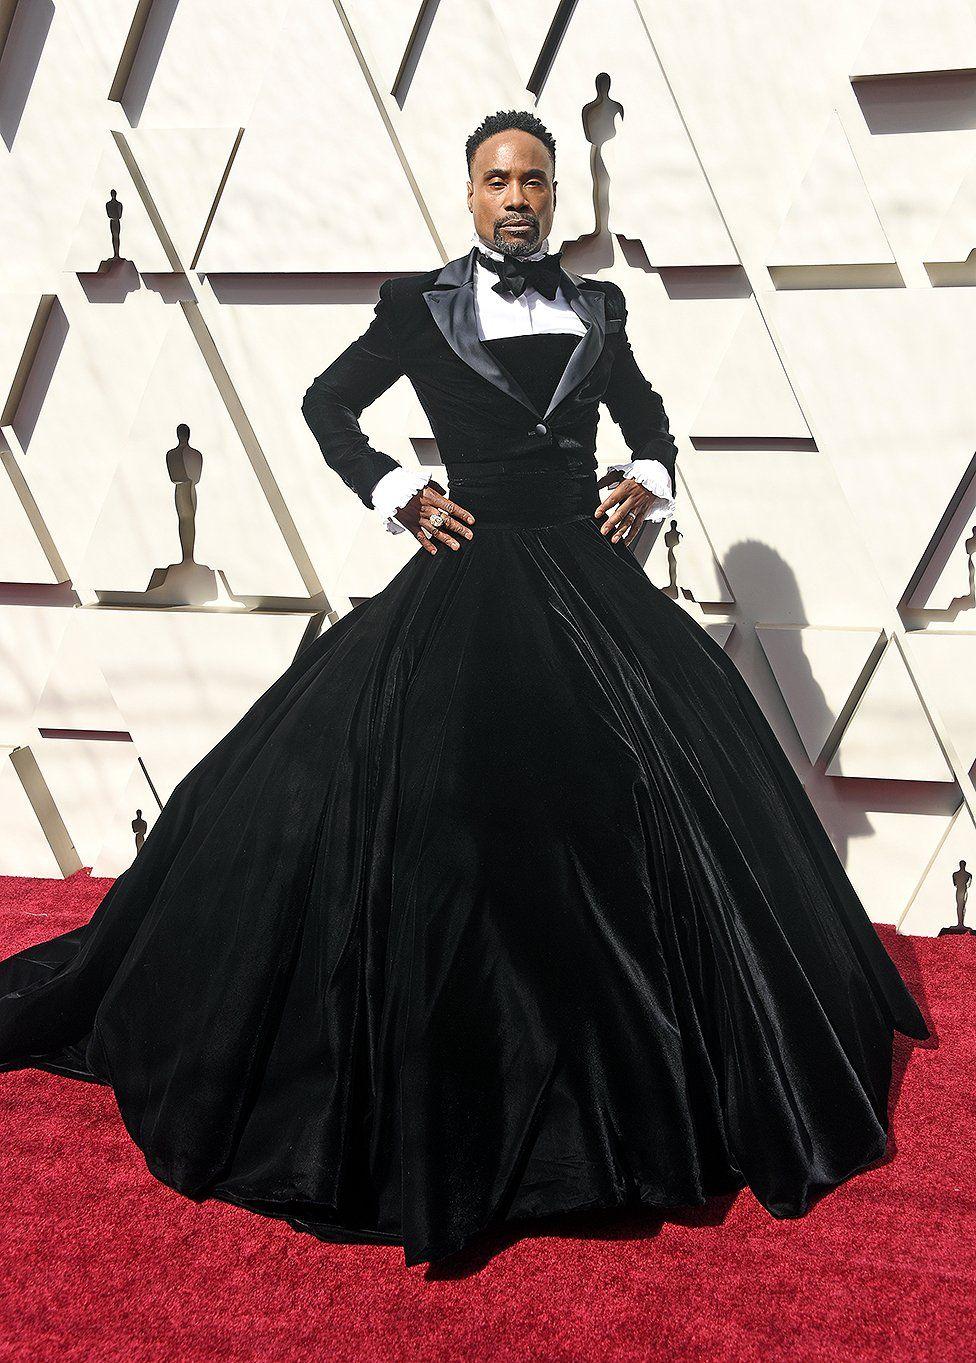 Billy Porter at the Oscars